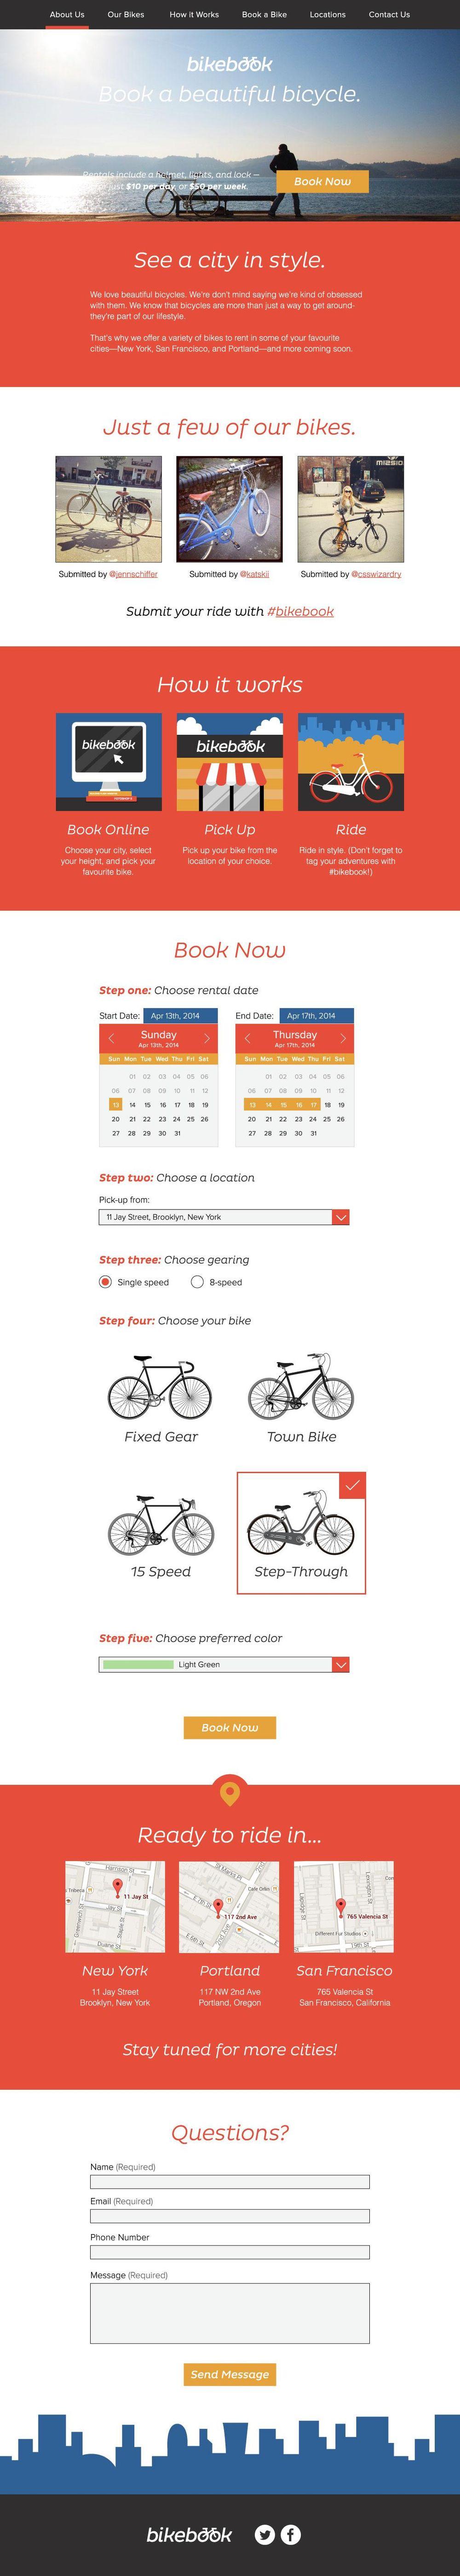 BikeBook Website - image 2 - student project